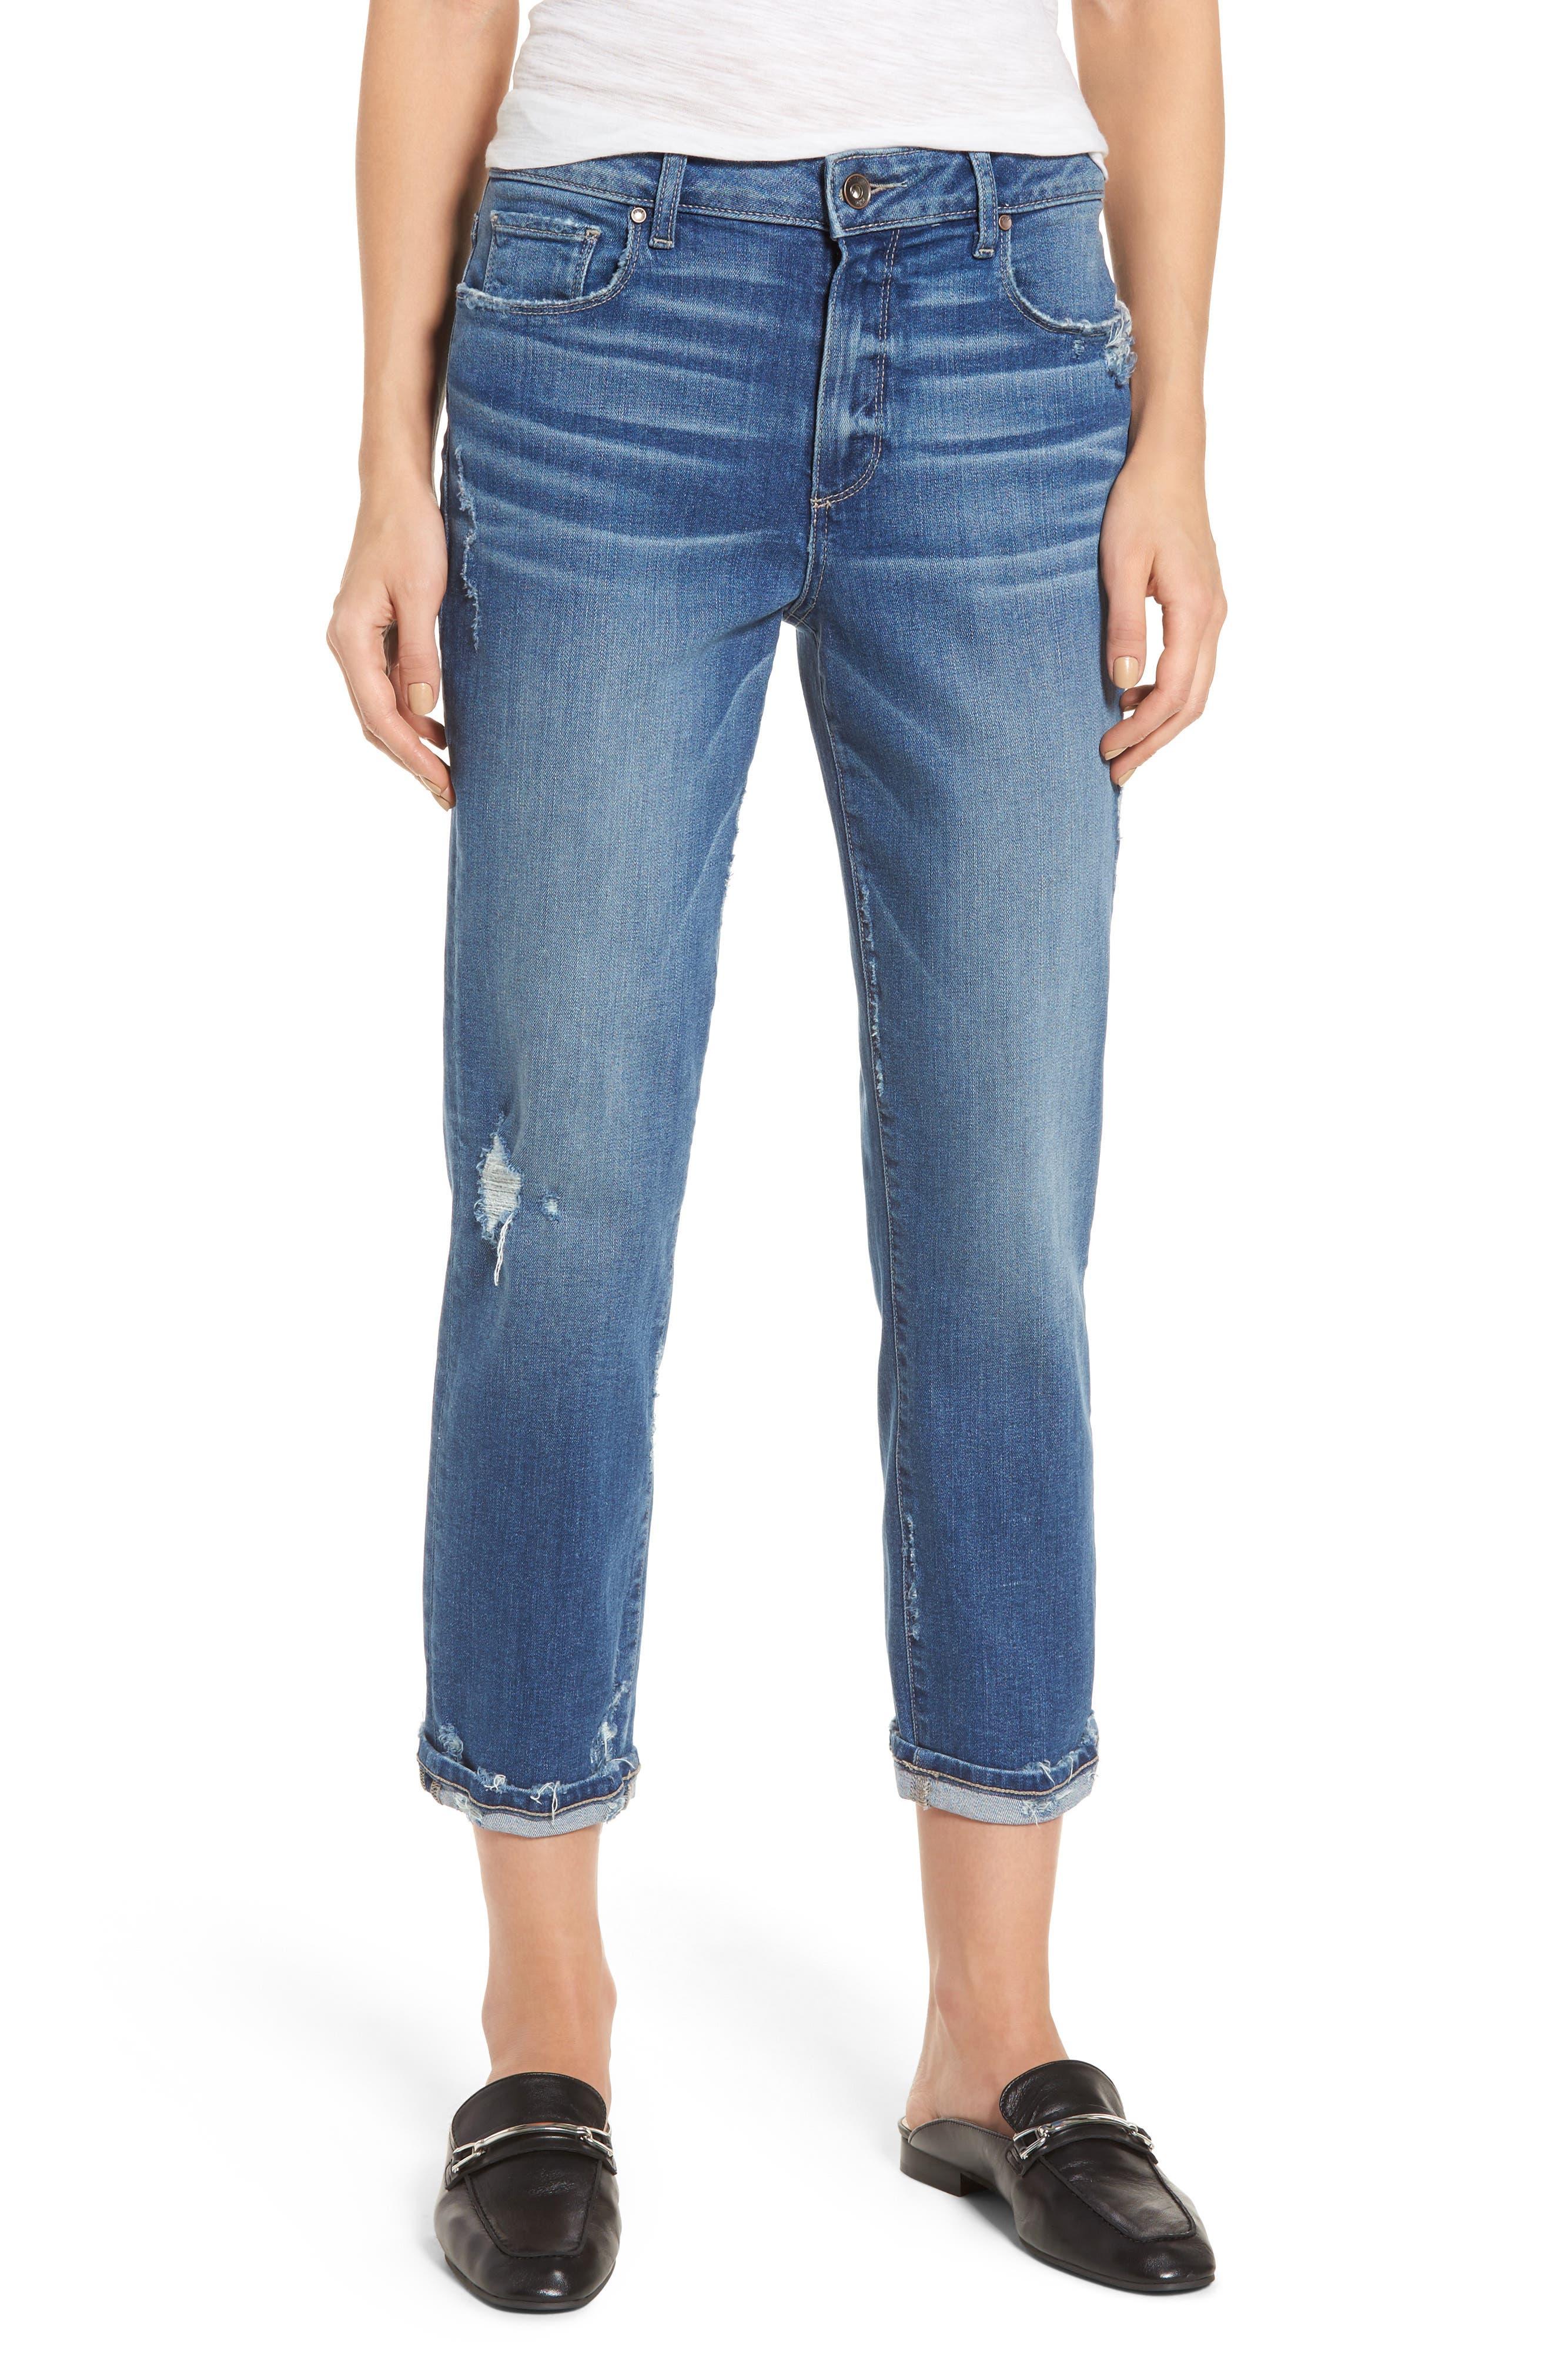 Jimmy Jimmy High Waist Crop Boyfriend Jeans,                             Main thumbnail 1, color,                             Ludlow Destructed